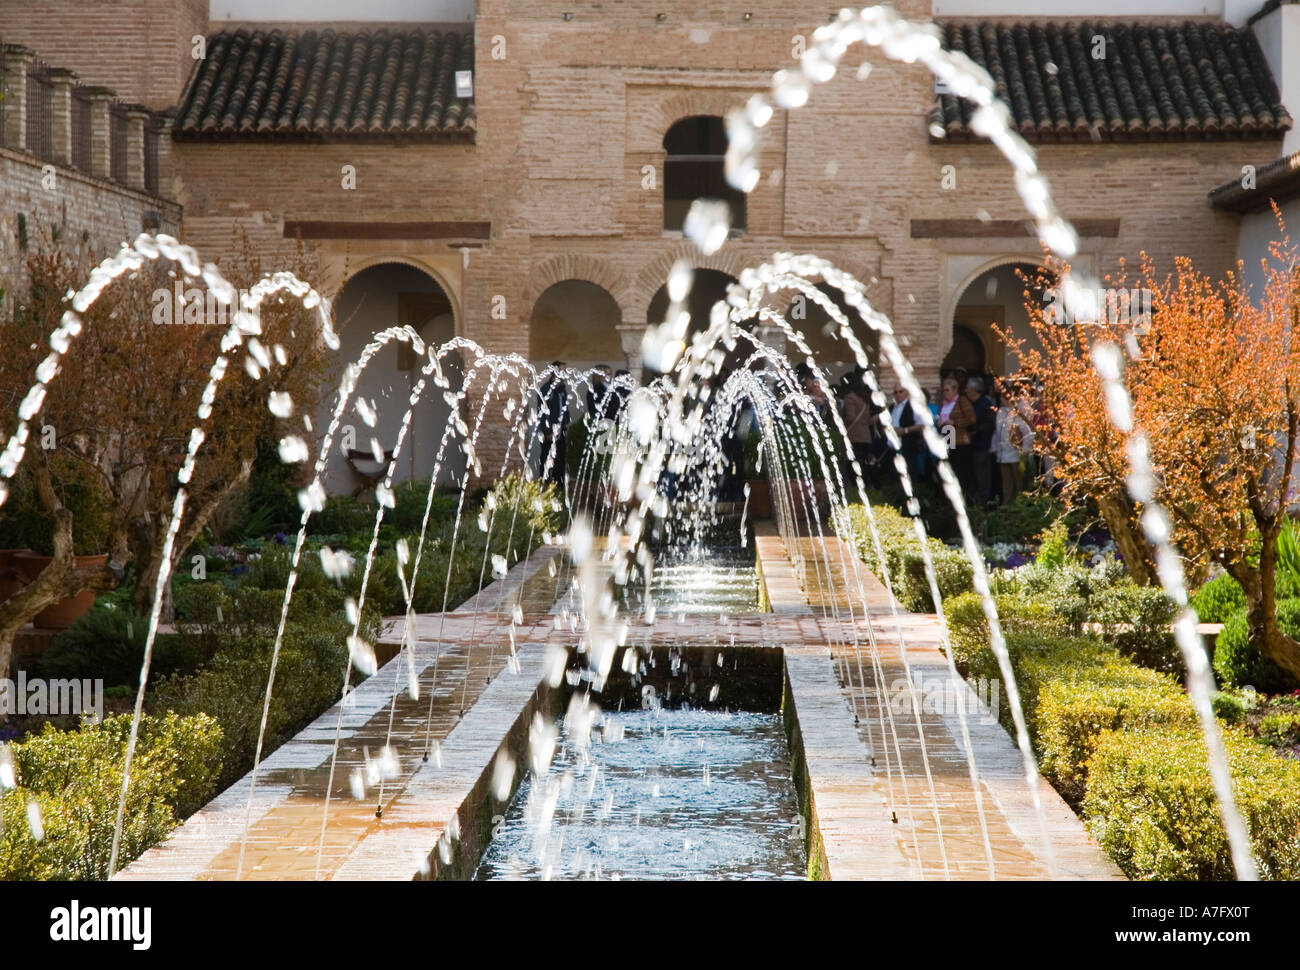 Water Fountains In The Patio De Le Azequia Alhambra Granada Spain Stock Photo Alamy